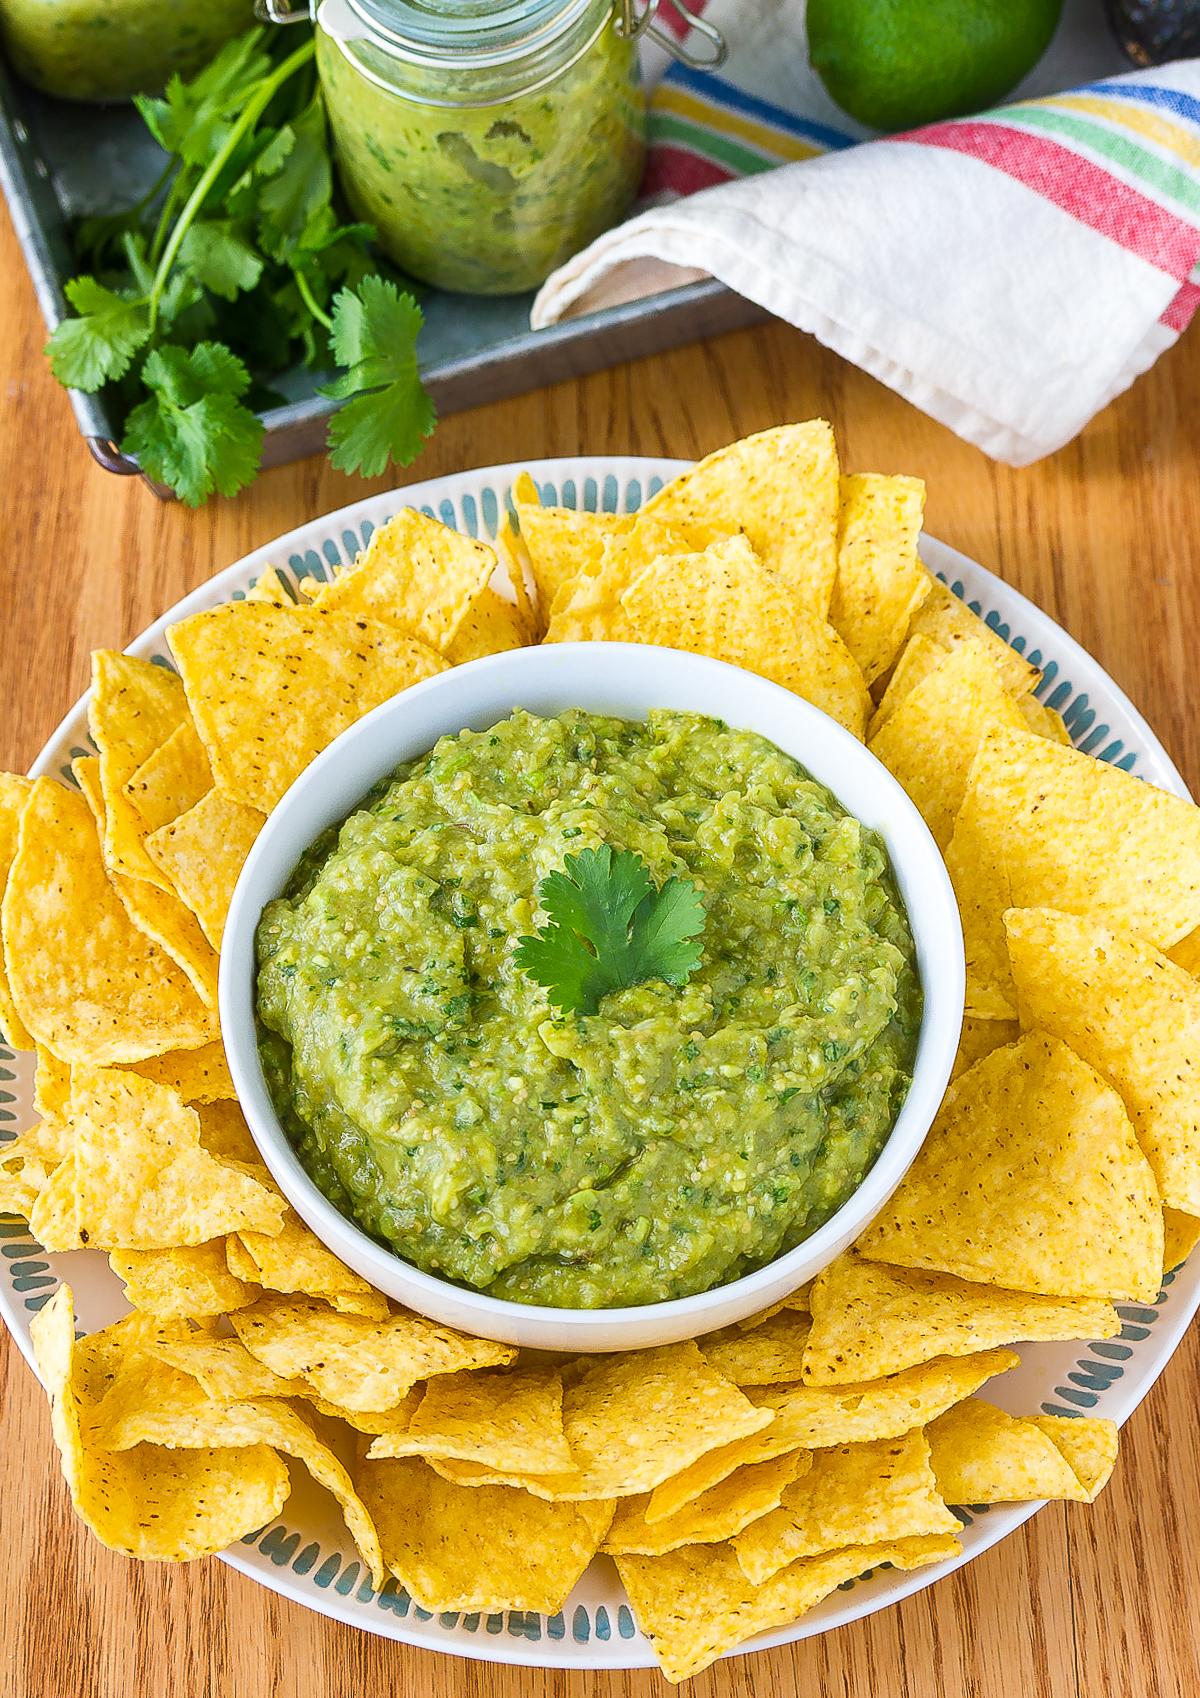 Easy Tomatillo Salsa Verde Recipe #ASpicyPerspective #homemade #salsa #salsaverde #verde #avocado #tomatillo #best #summer #fresh